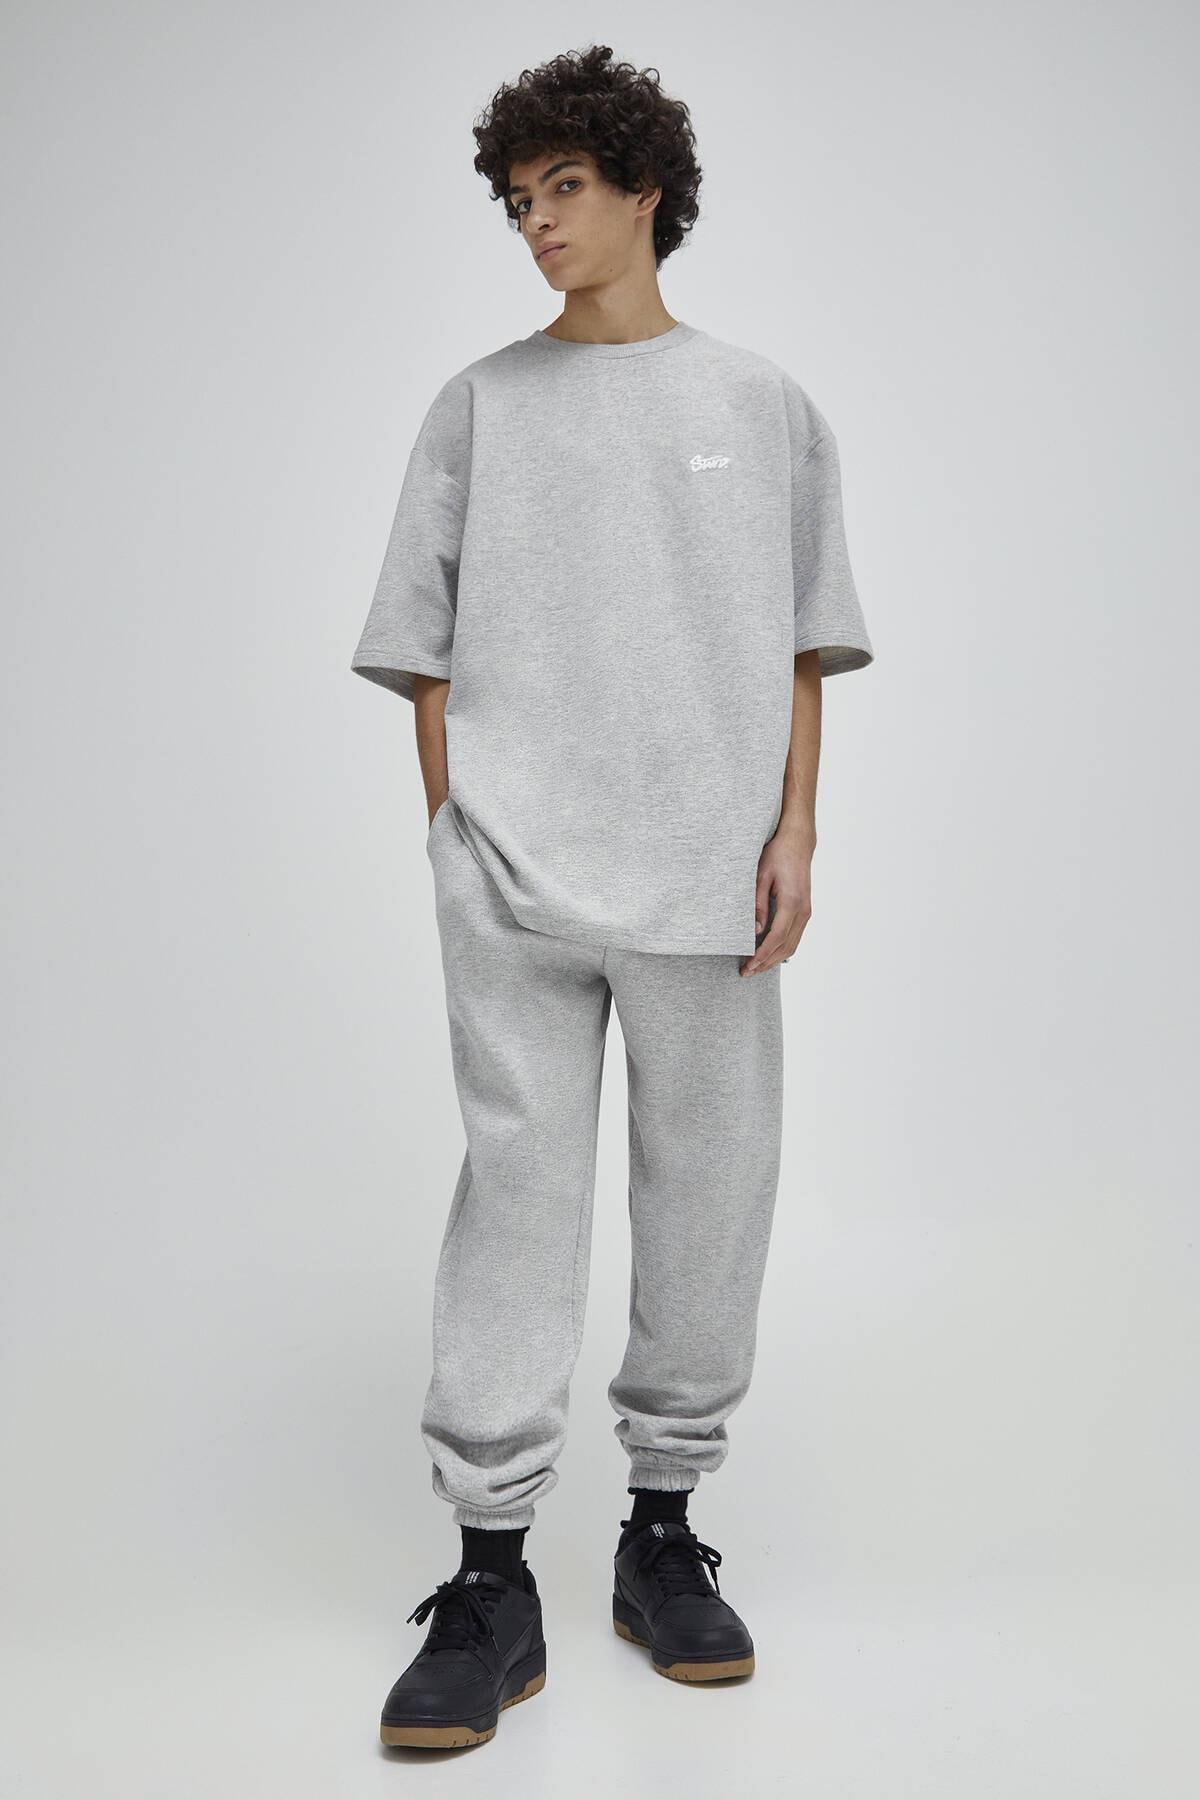 Pull & Bear Erkek Açık Gri Homewear Kapsül Koleksiyonu T-Shirt 04240542 1